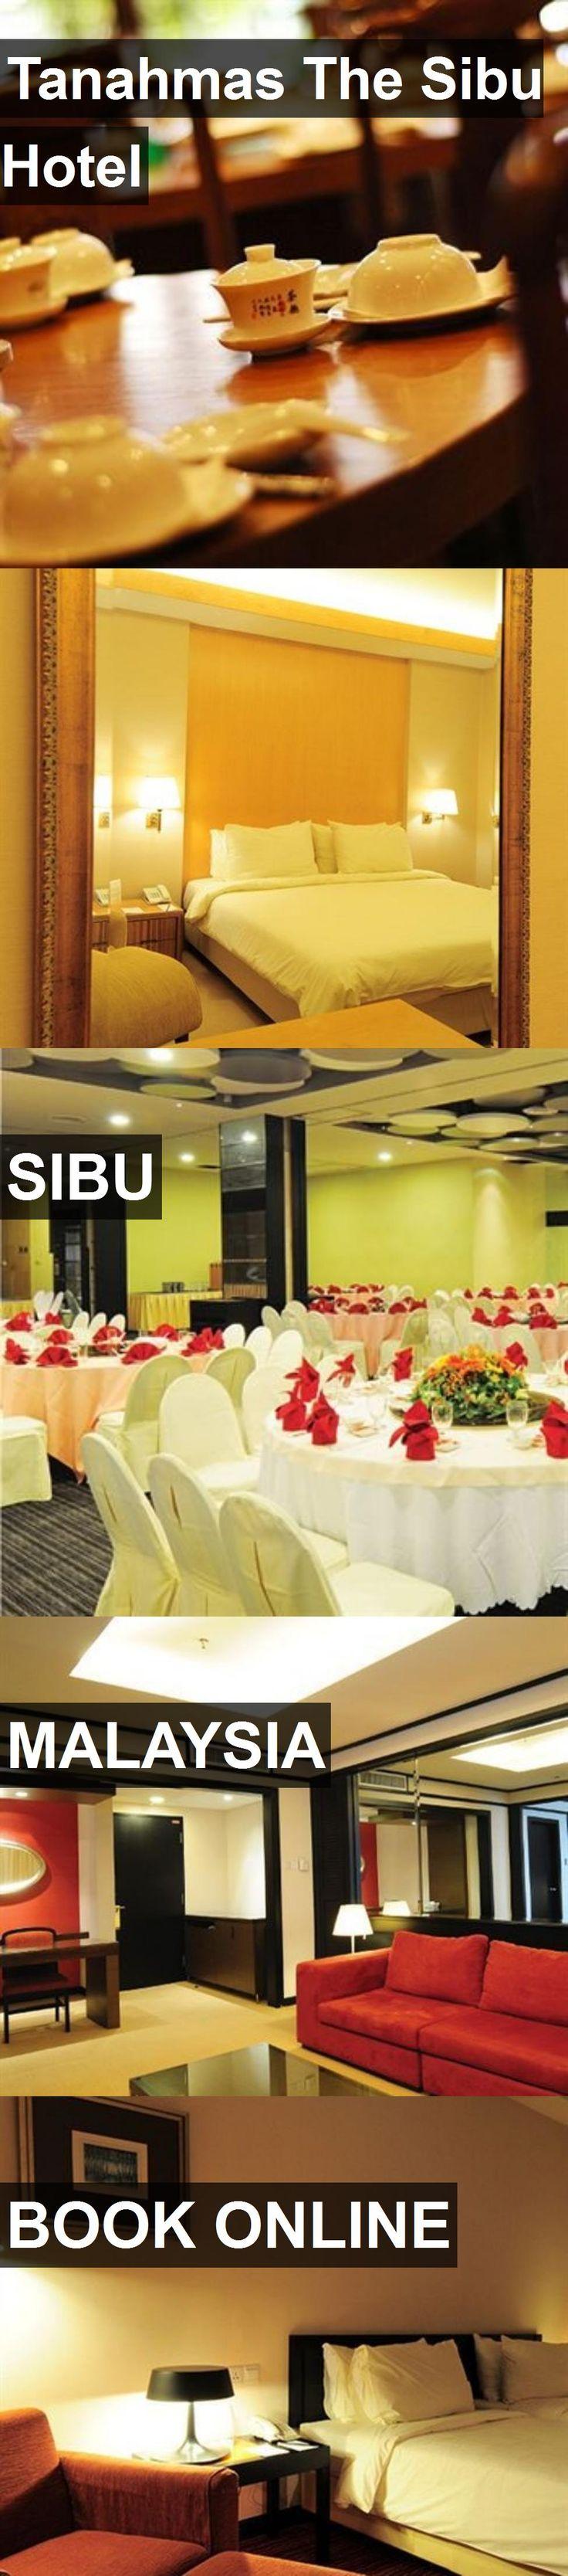 Hotel Tanahmas The Sibu Hotel in Sibu, Malaysia. For more information, photos, reviews and best prices please follow the link. #Malaysia #Sibu #TanahmasTheSibuHotel #hotel #travel #vacation